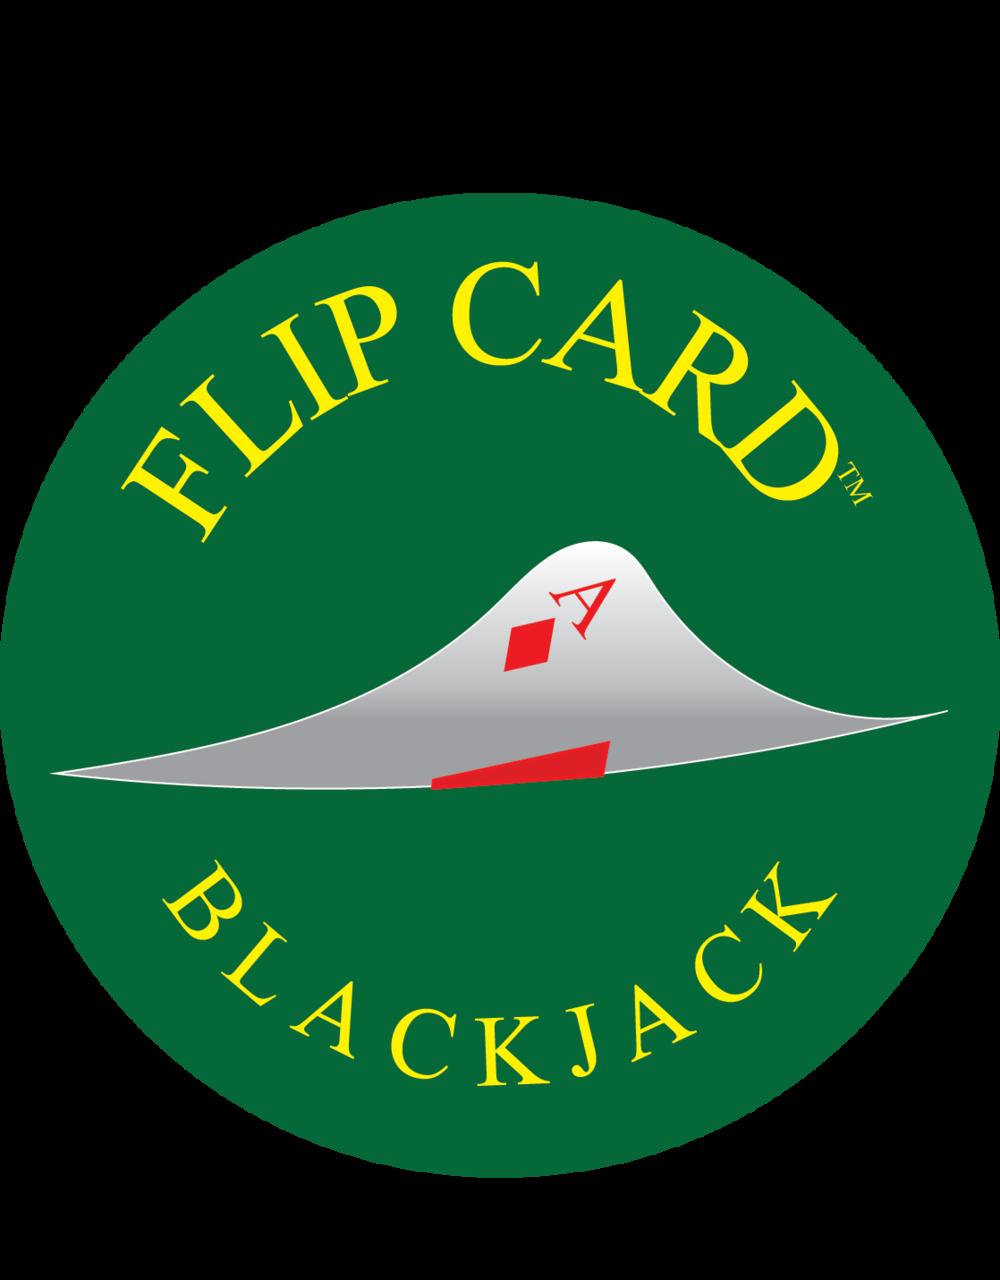 FLIP CARD logo 5-13-15.png